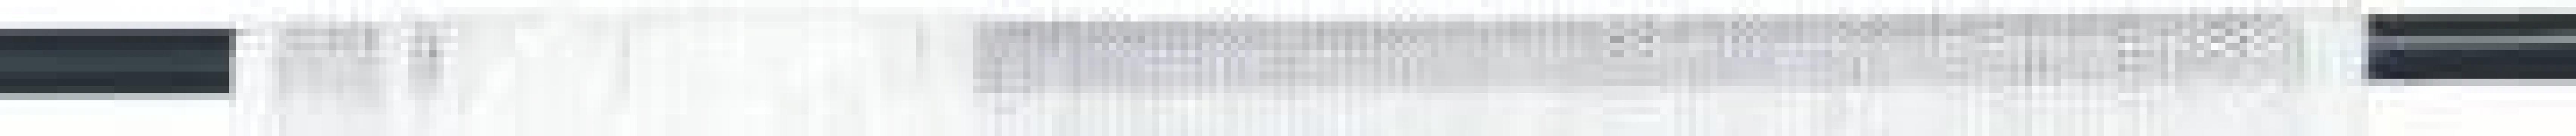 Draperii franjuri, 2 buc., 100 x 250 cm, alb de la Vidaxl